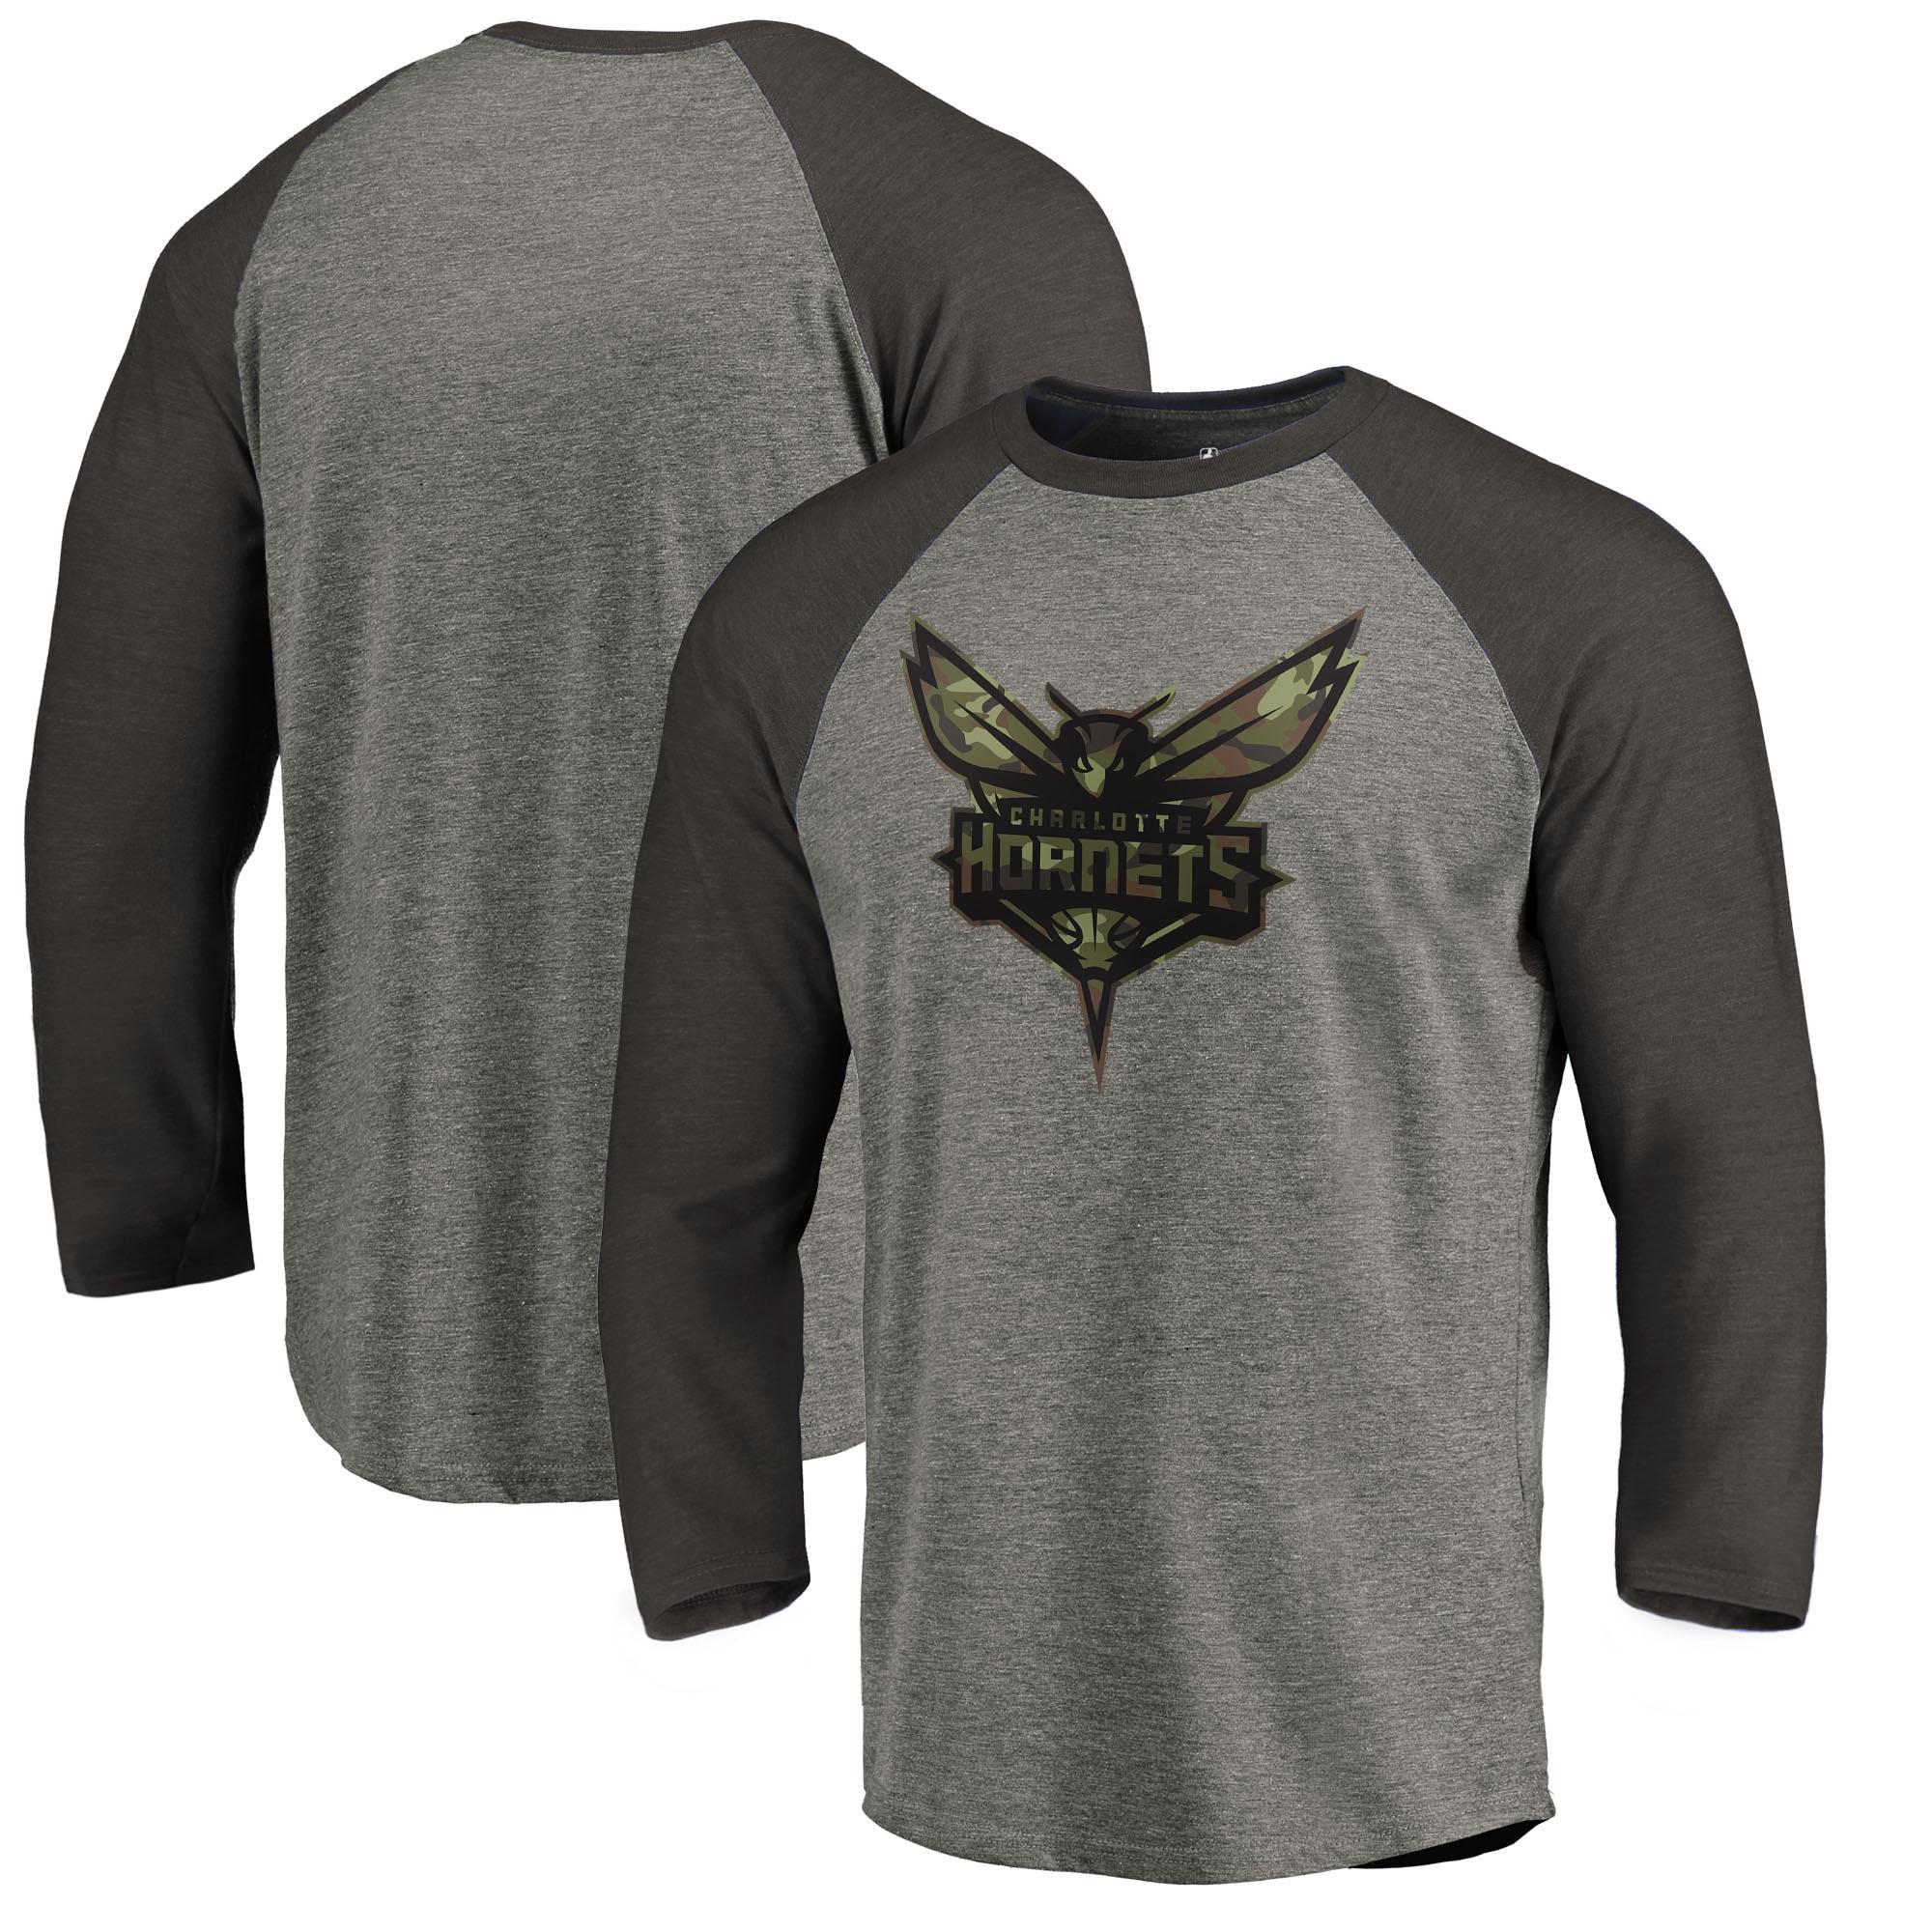 Charlotte Hornets Fanatics Branded Camo Collection Prestige 3/4-Sleeve Raglan T-Shirt - Heathered Gray